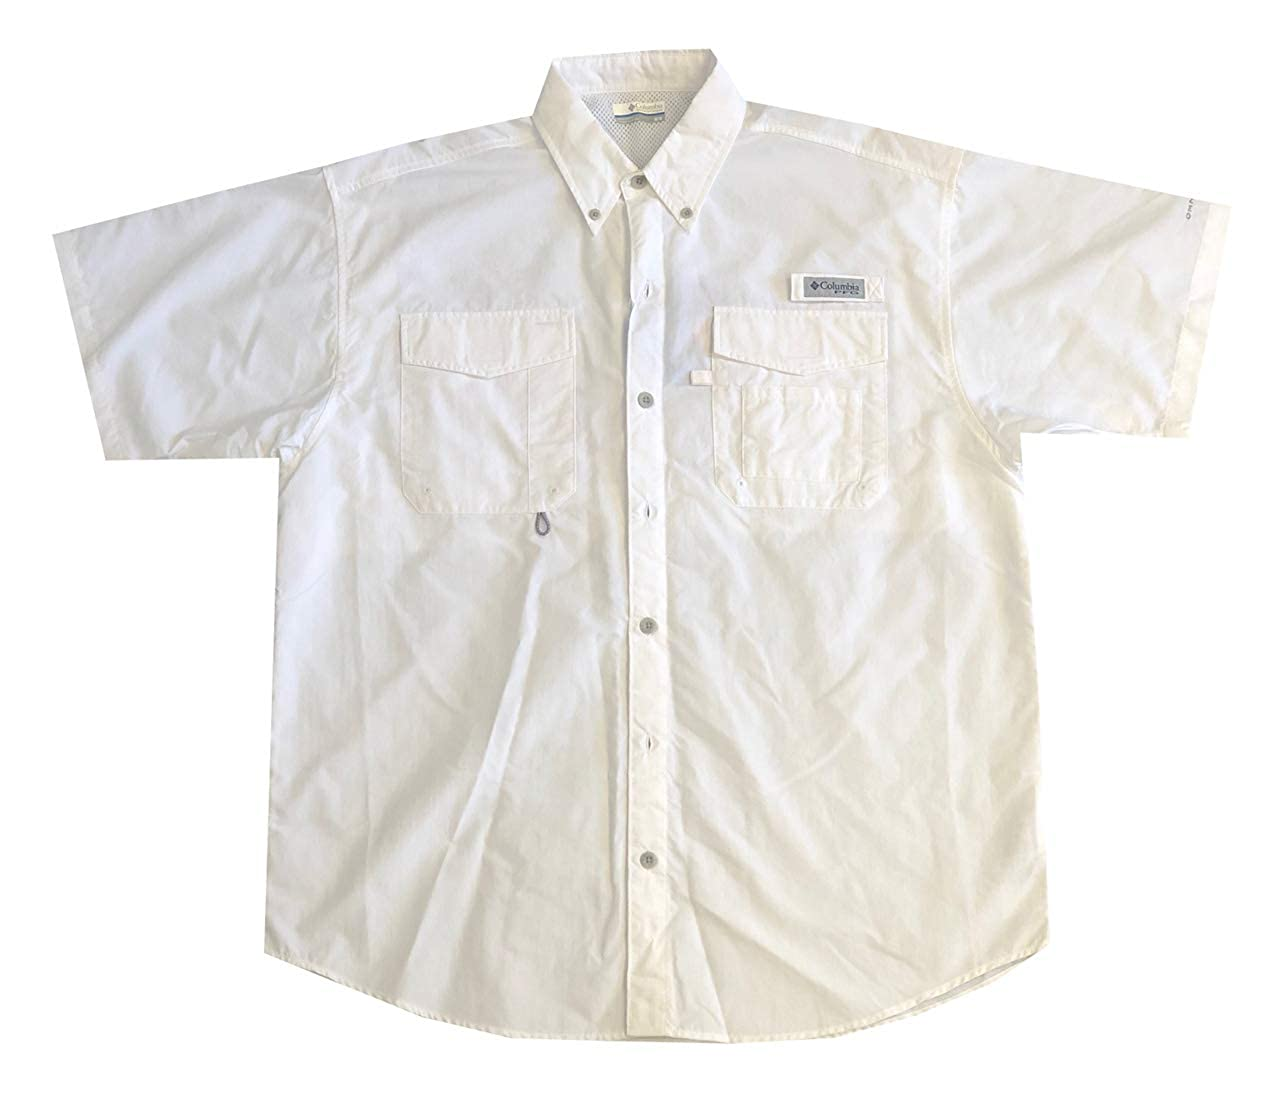 6870c5db694 Columbia Men's PFG Omni-Shade UPF 30 Distant Water Short Sleeve Vented Shirt  at Amazon Men's Clothing store: